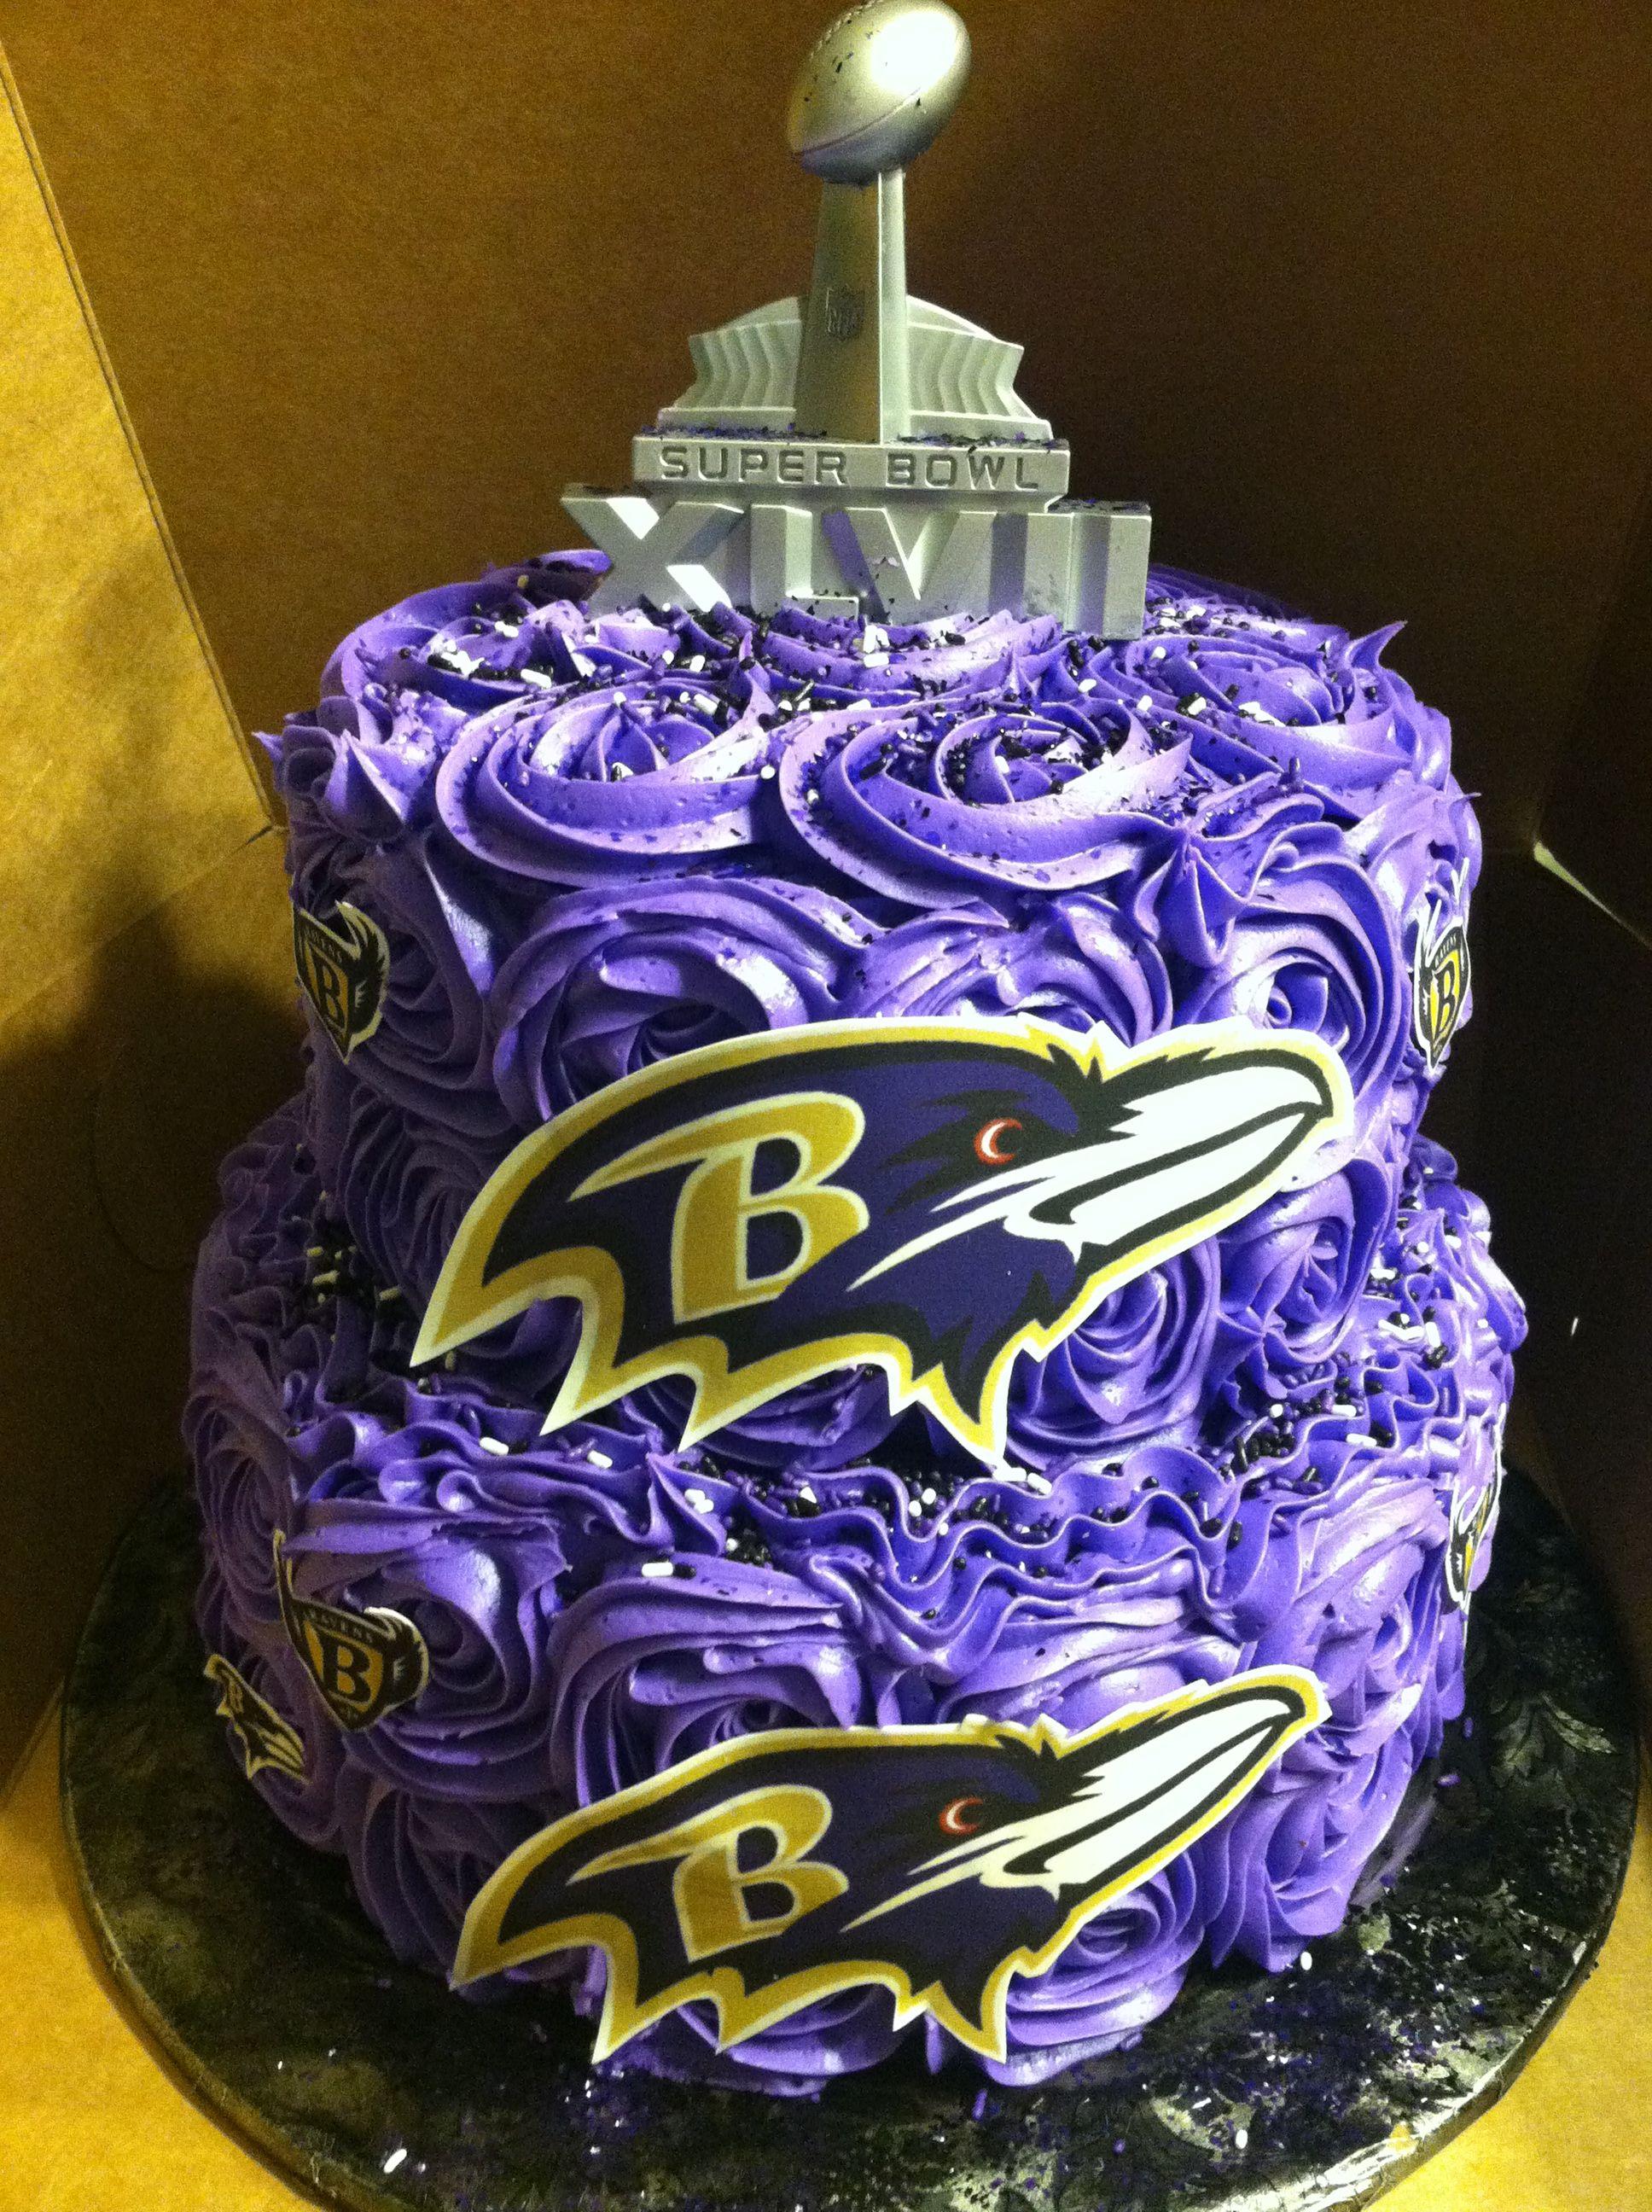 Ravens Super Bowl Cake I Like The Icing Swirls With Images